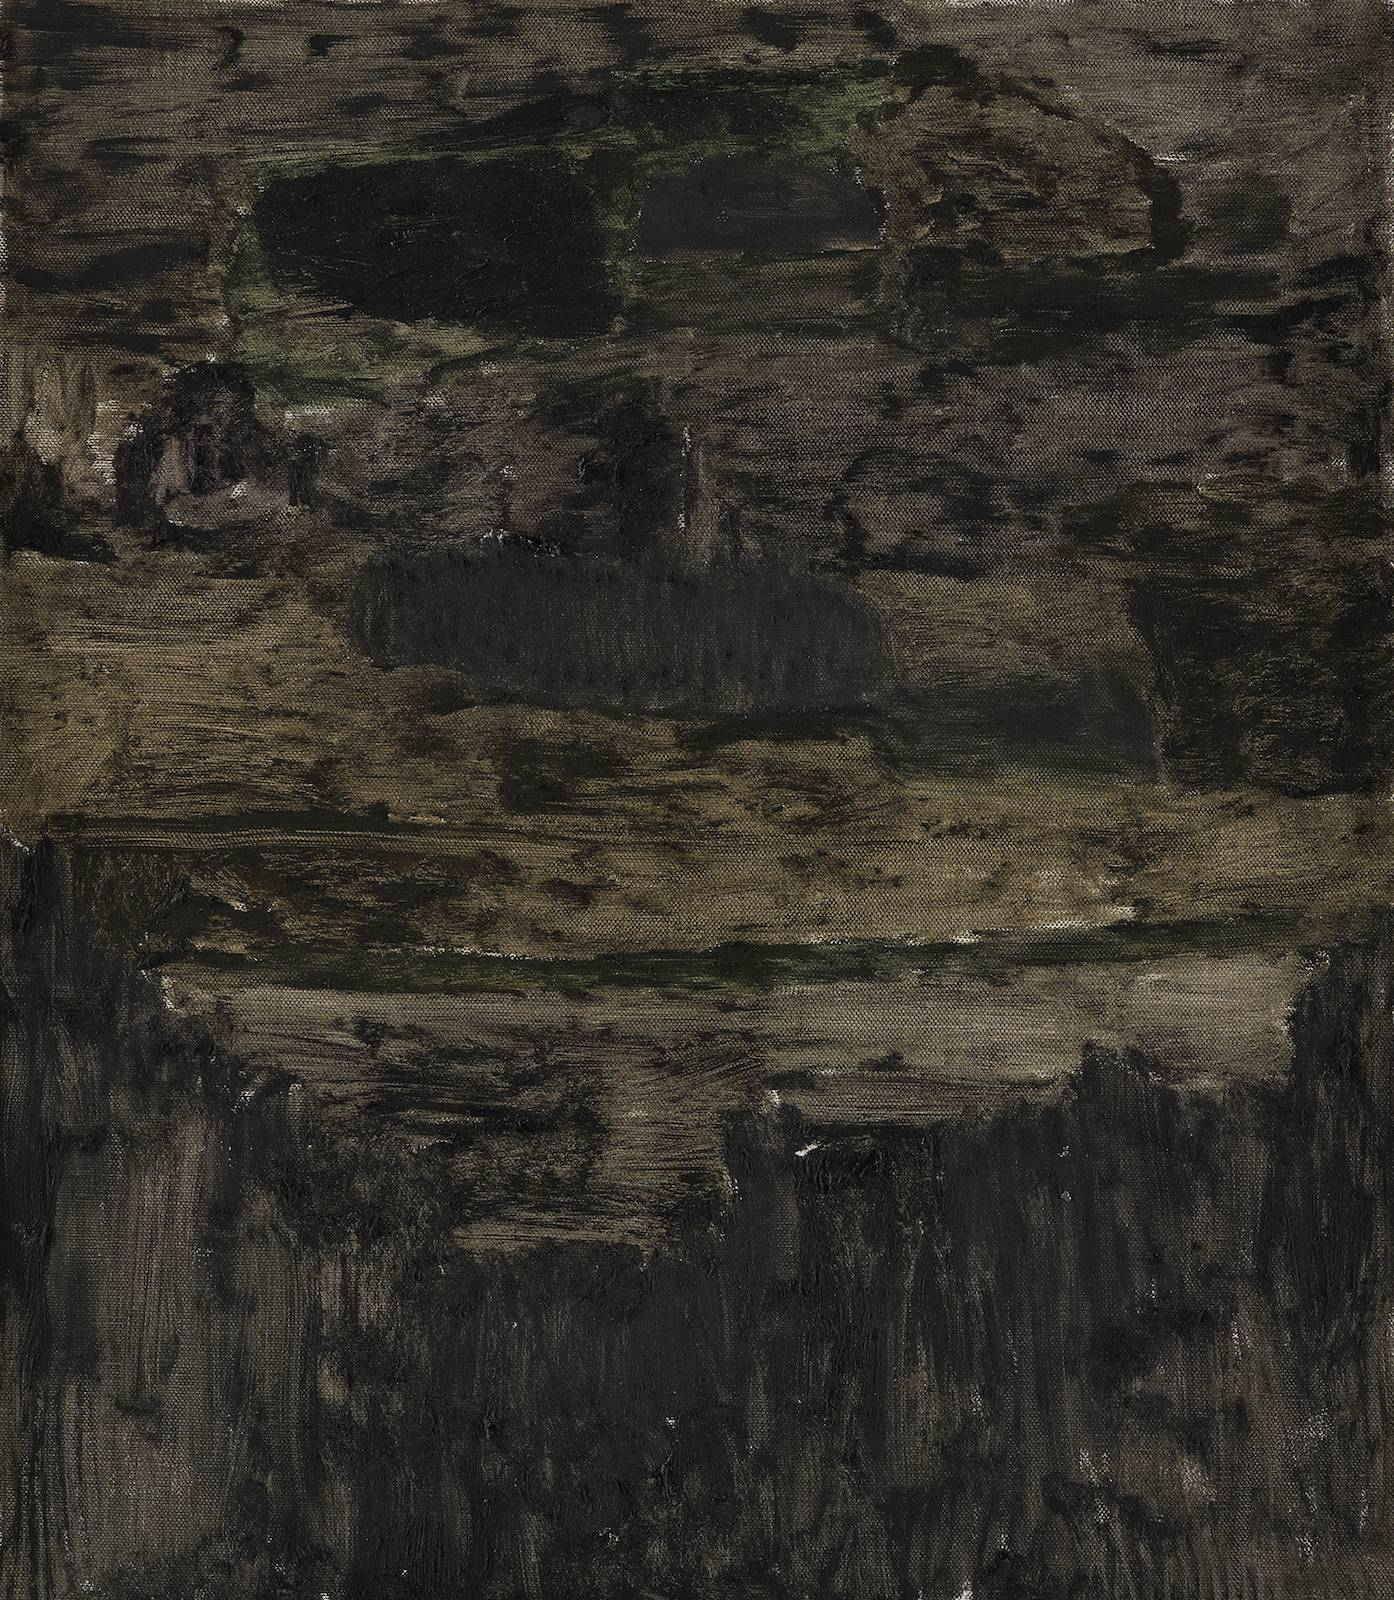 Landskap 8, 2012, oil on canvas, 74,5 x 64,5 cm